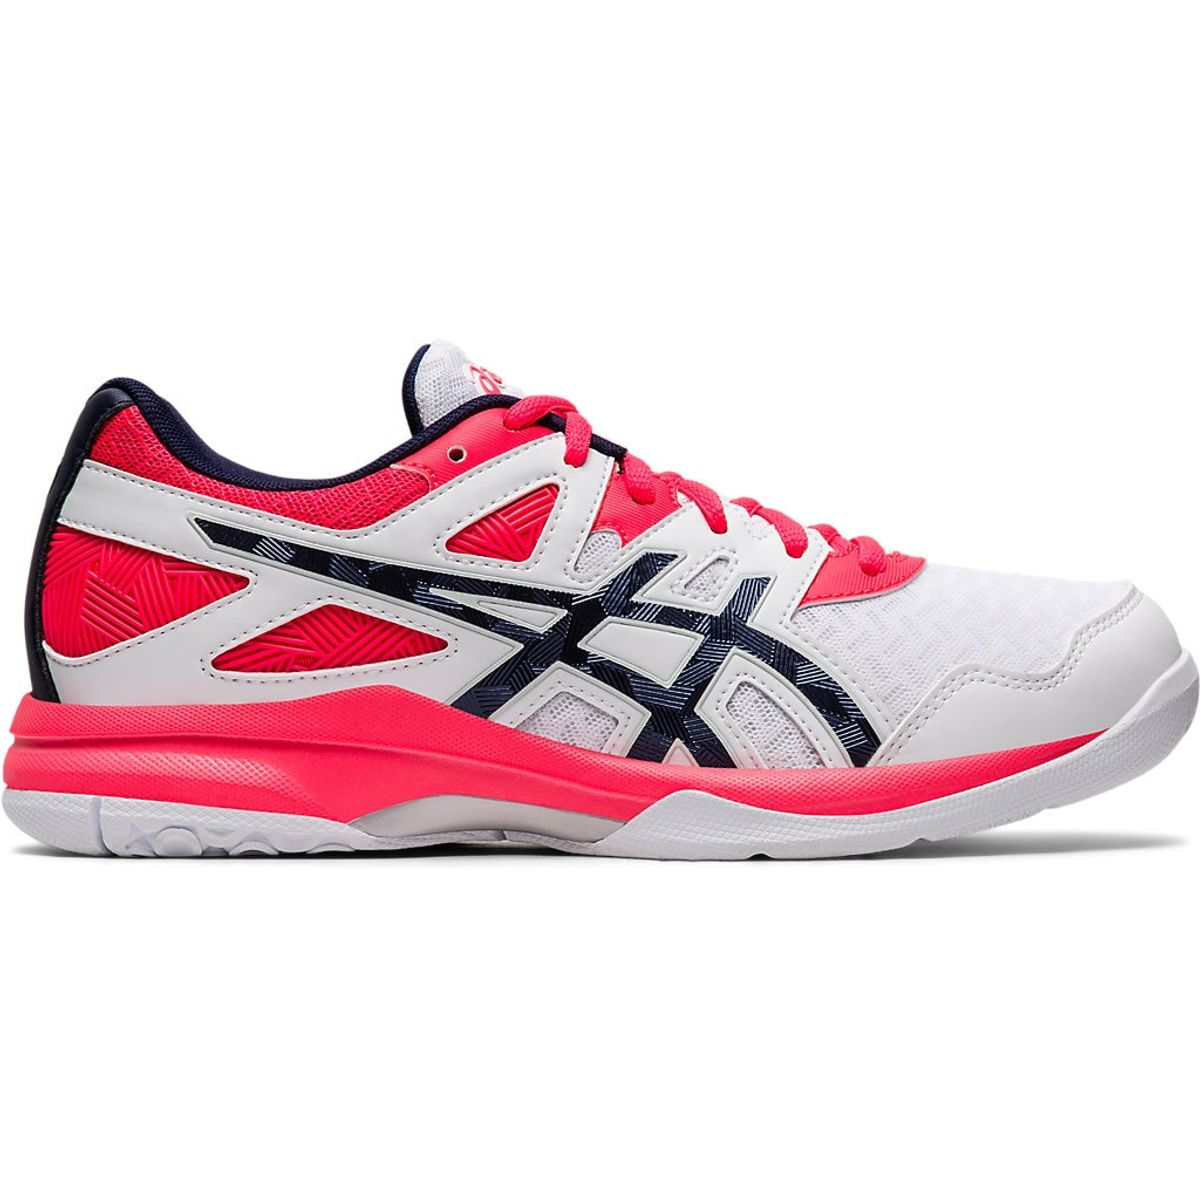 Tenis-Asics-GEL-Task-2---Feminino---Branco